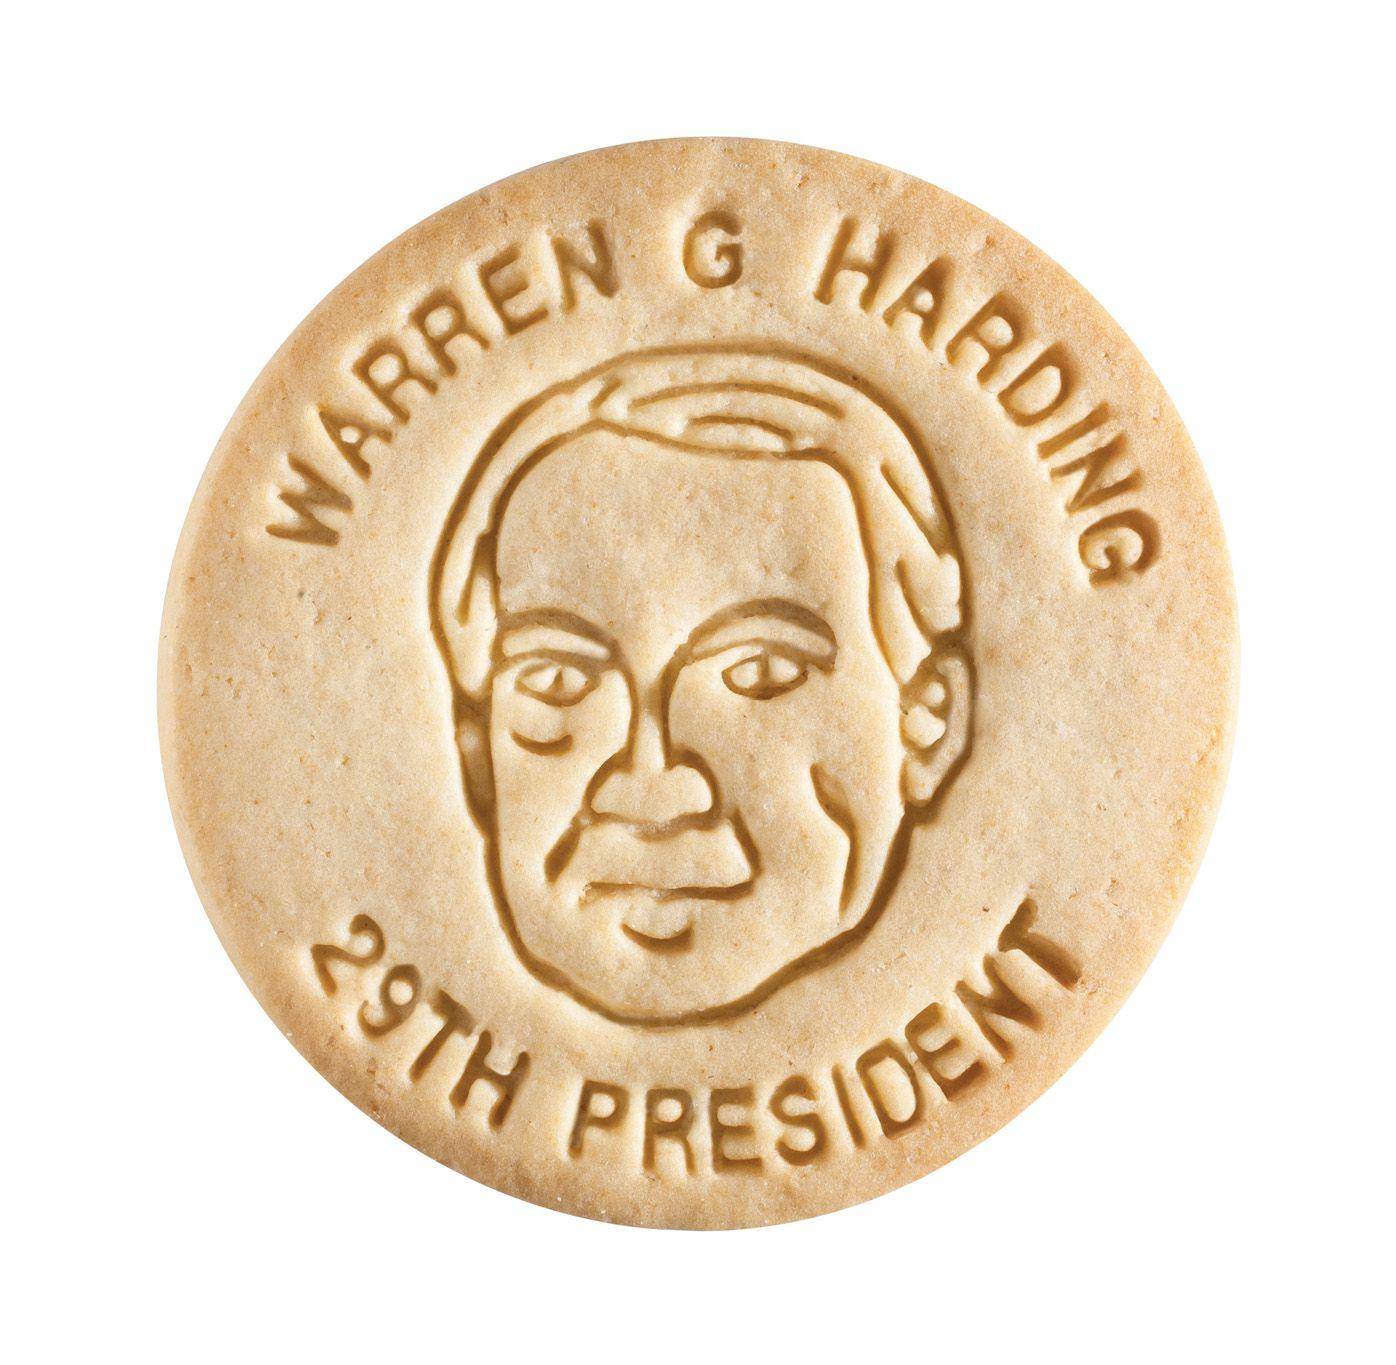 Dick & Jane Educational Snacks;  Presidential Edition;  Warren Gamaliel Harding,   29th President,   1921-1923